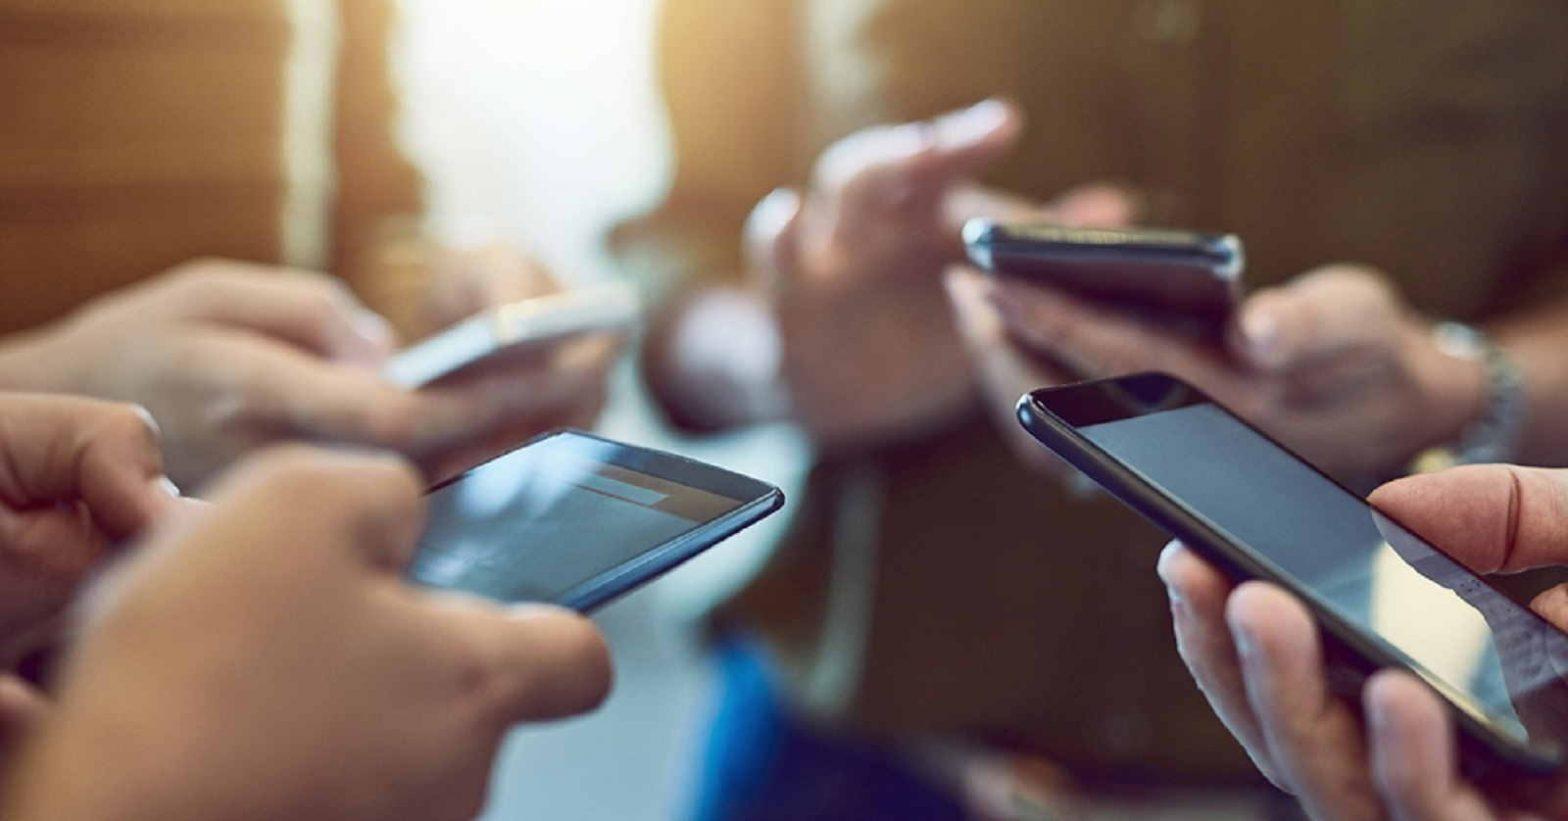 Smartphone-Usage-Increases